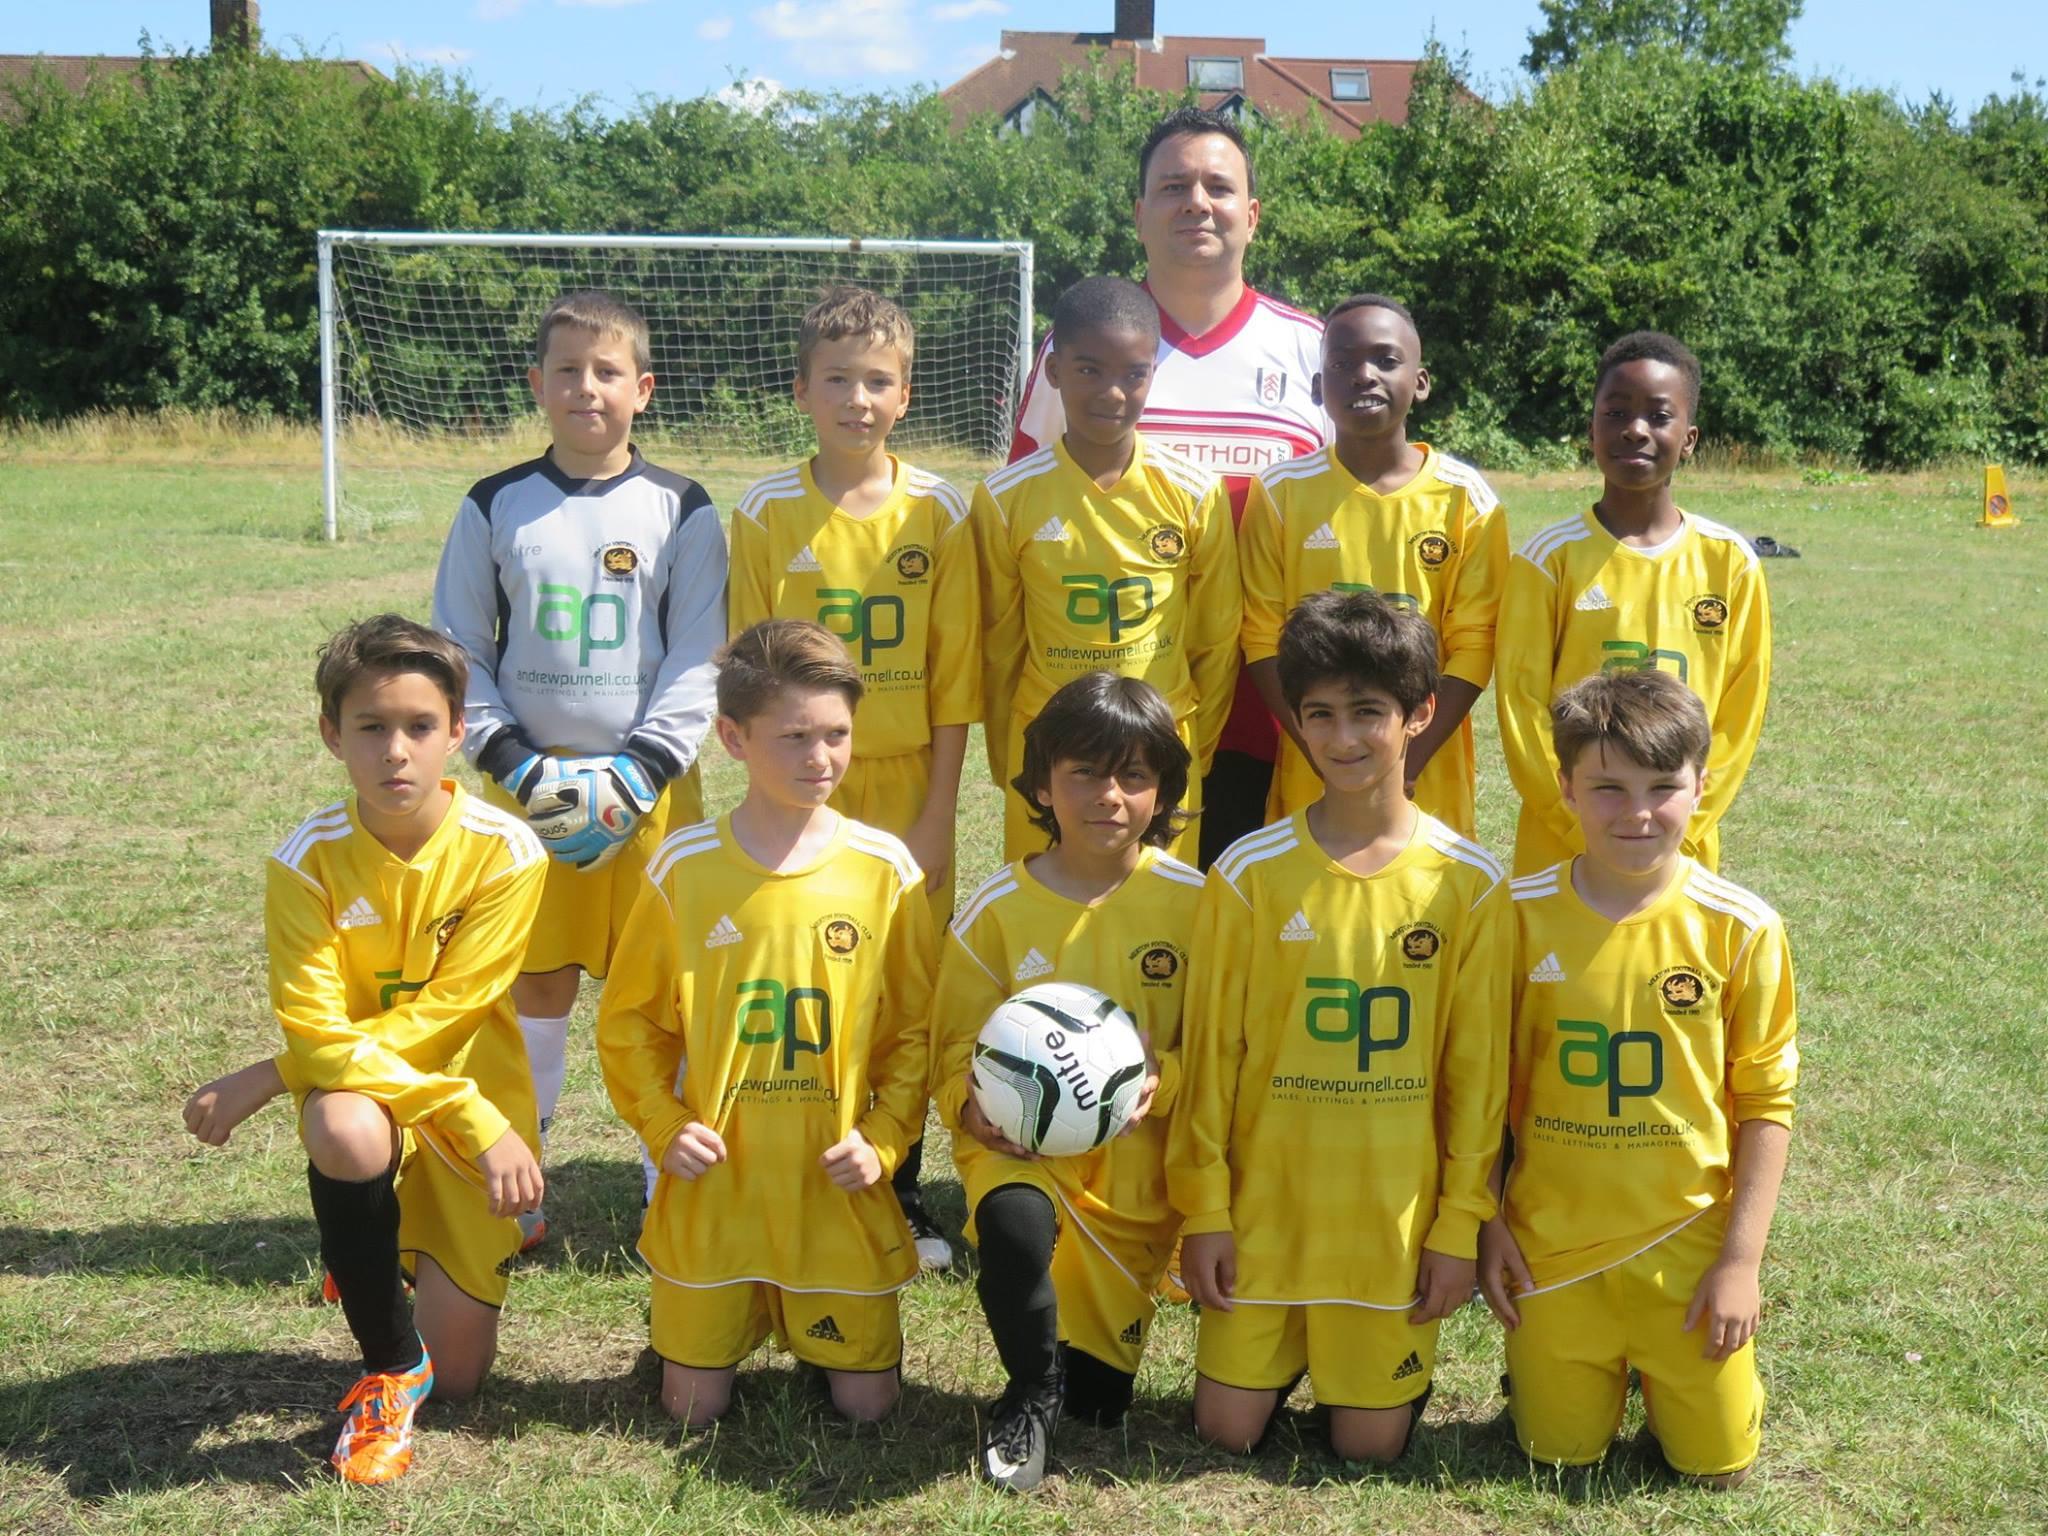 Youth U11s